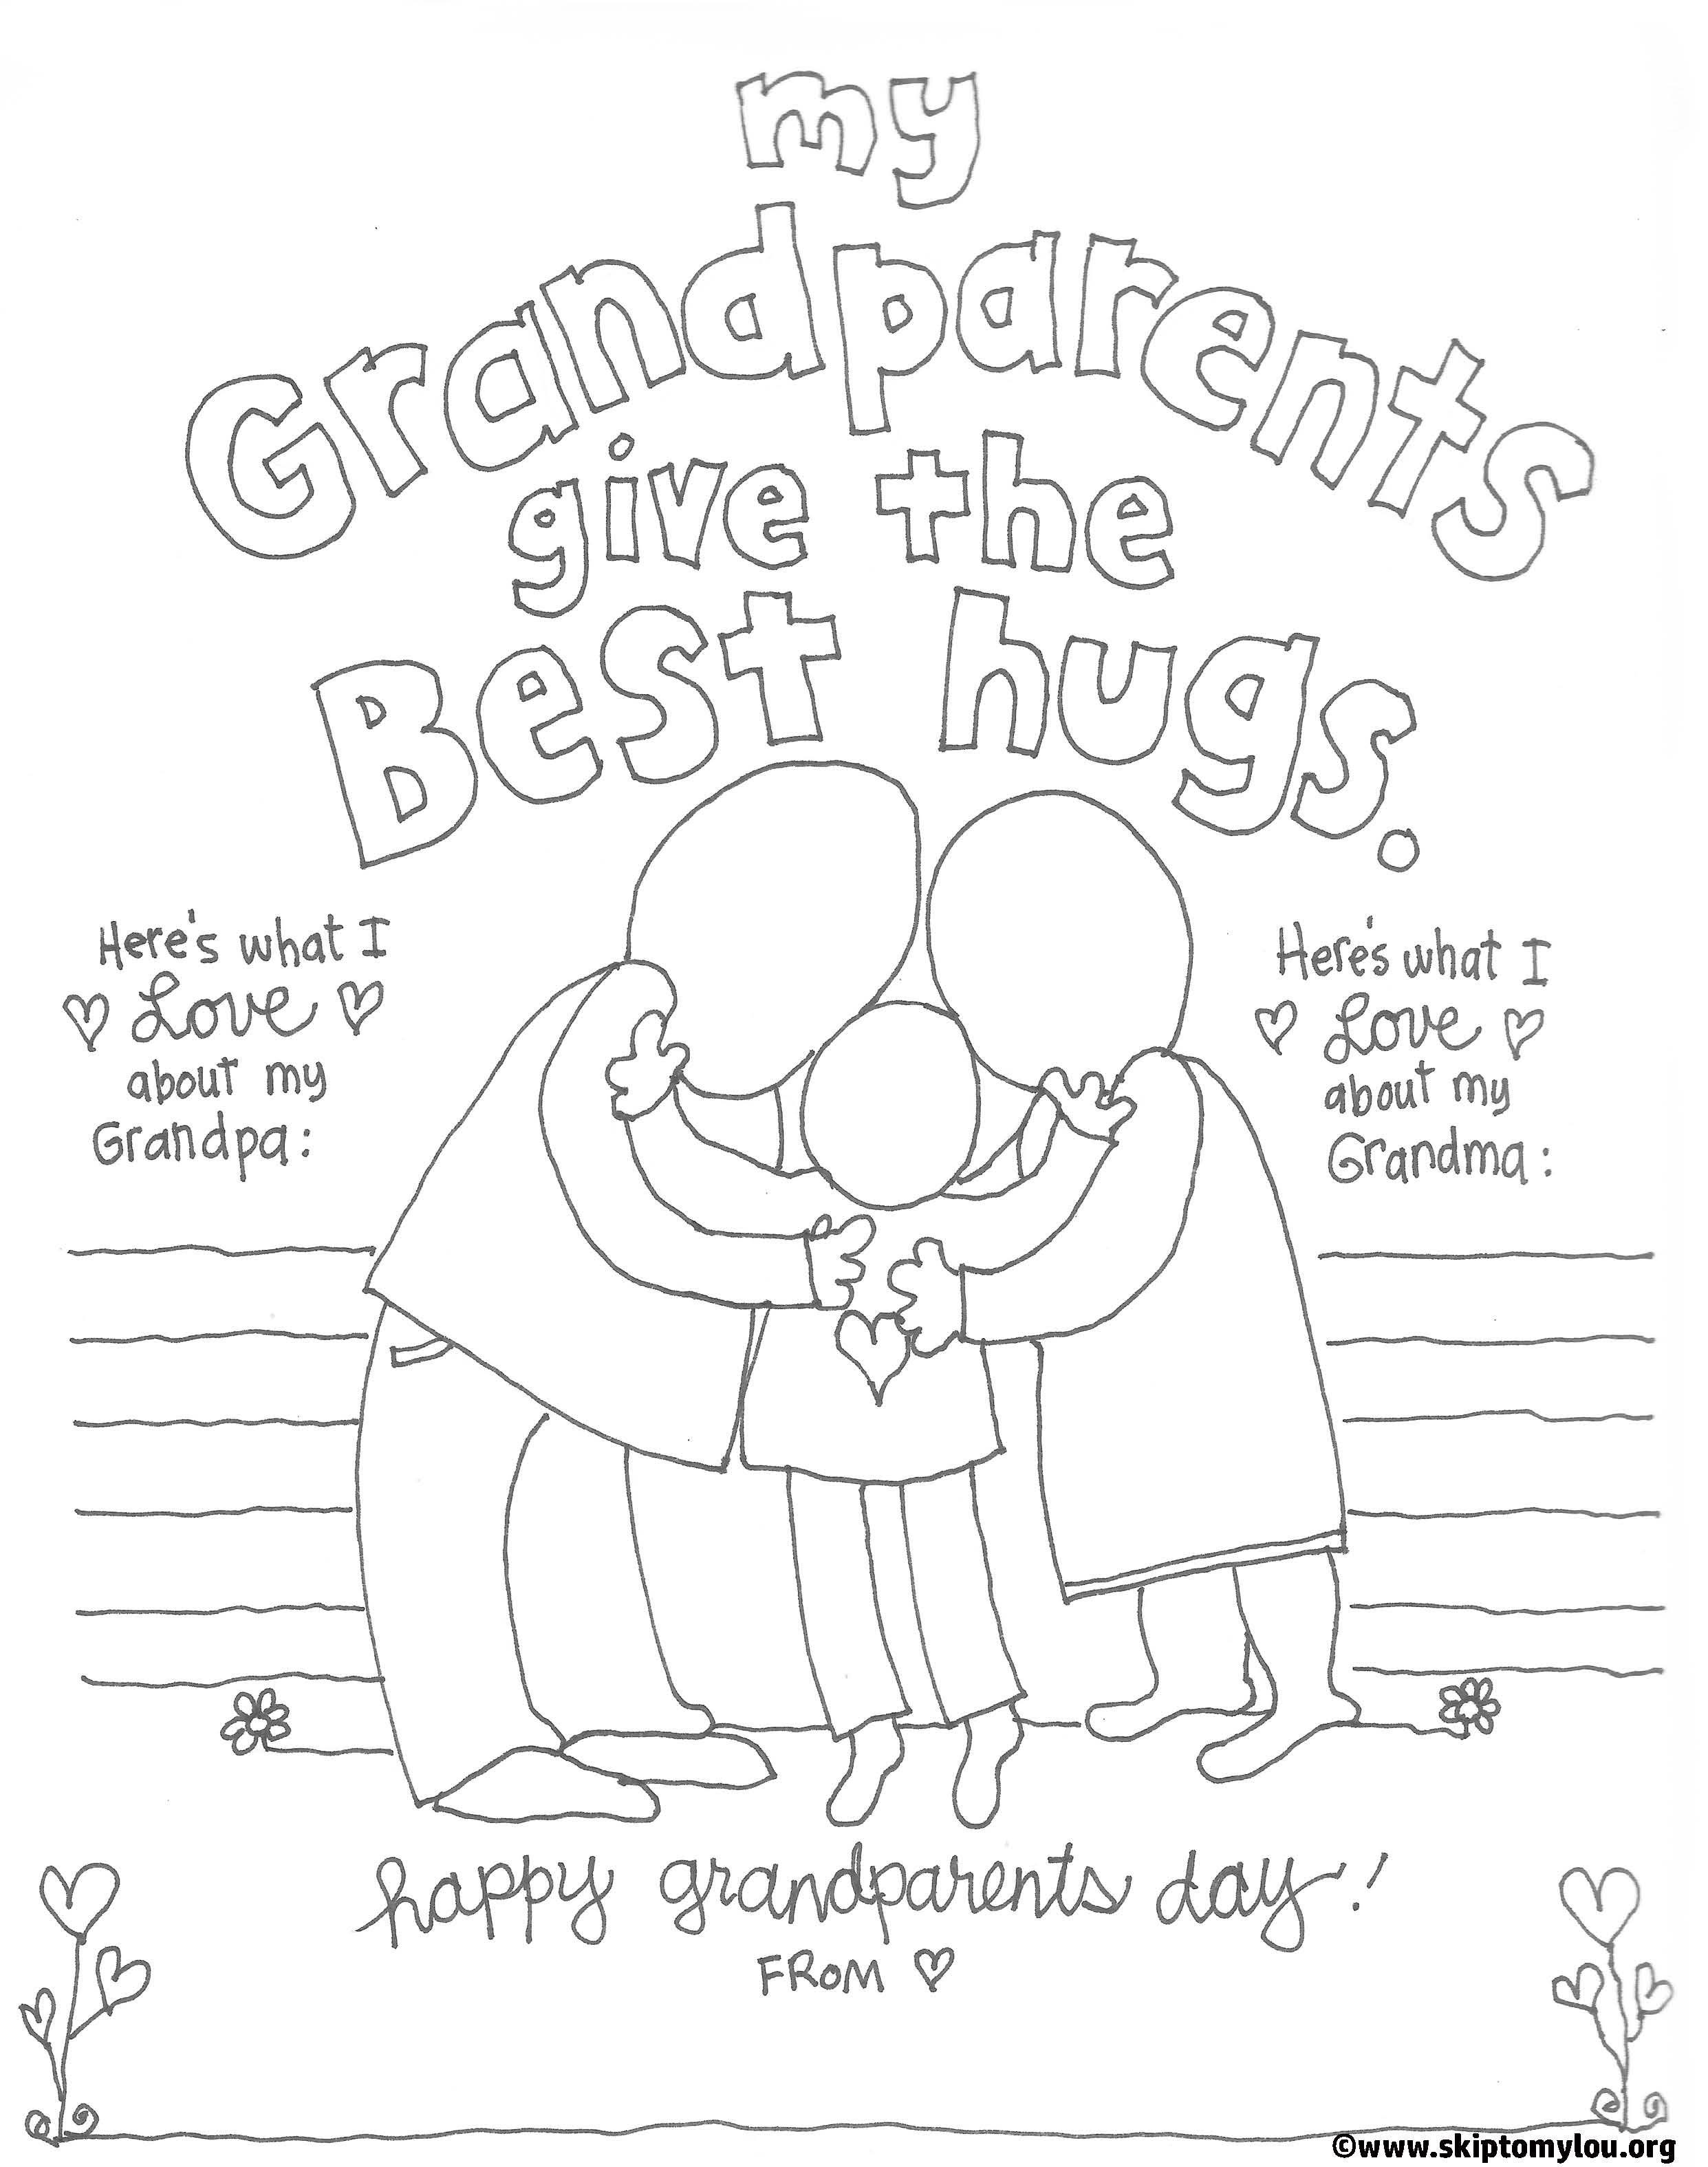 Grandparents Day 9/13/15 …   U Kids Events/Ideas   Pinterest